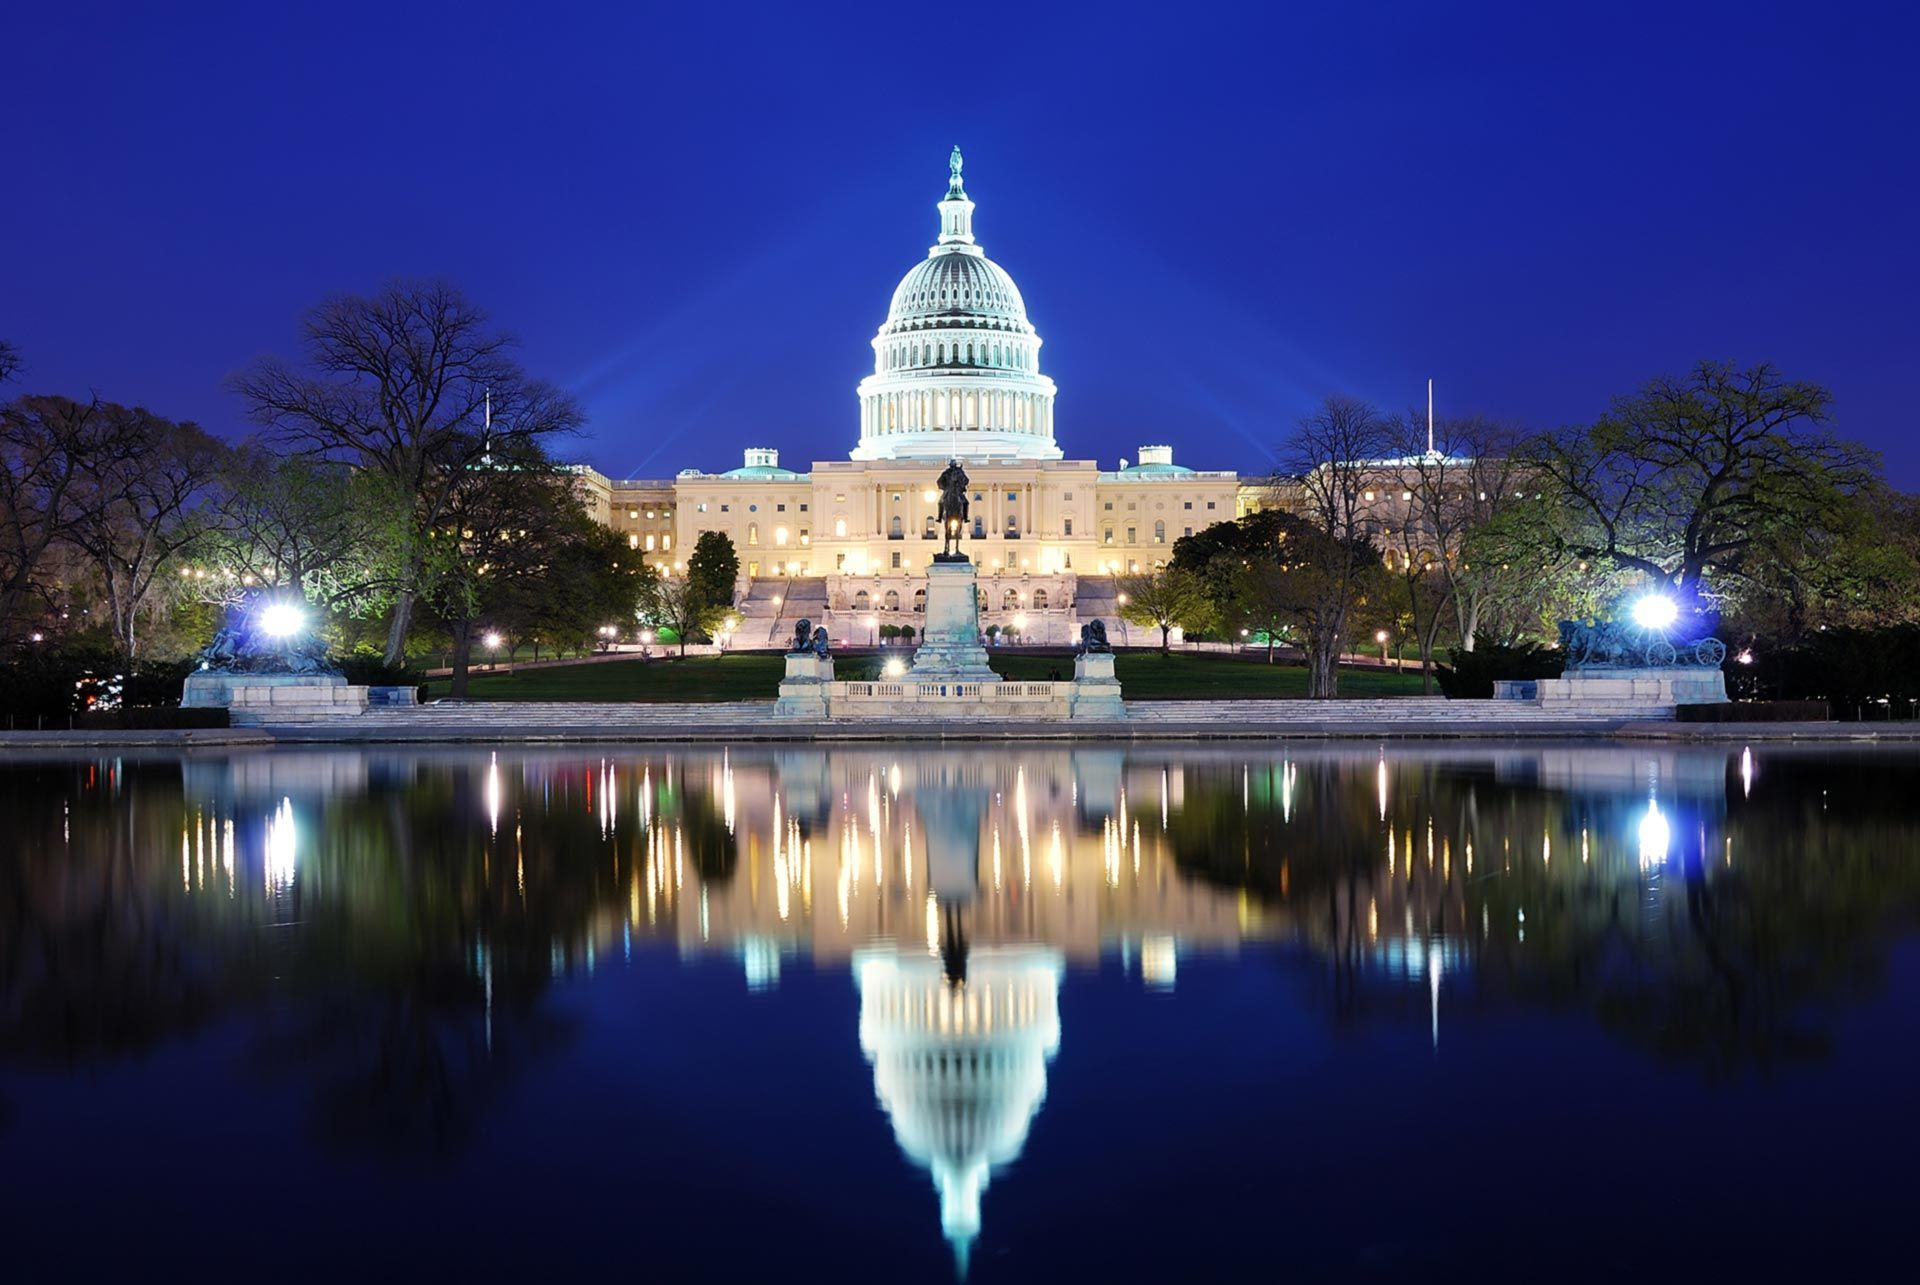 Tour Washington Dc With Informative Fun Tour Guides Who Will Make